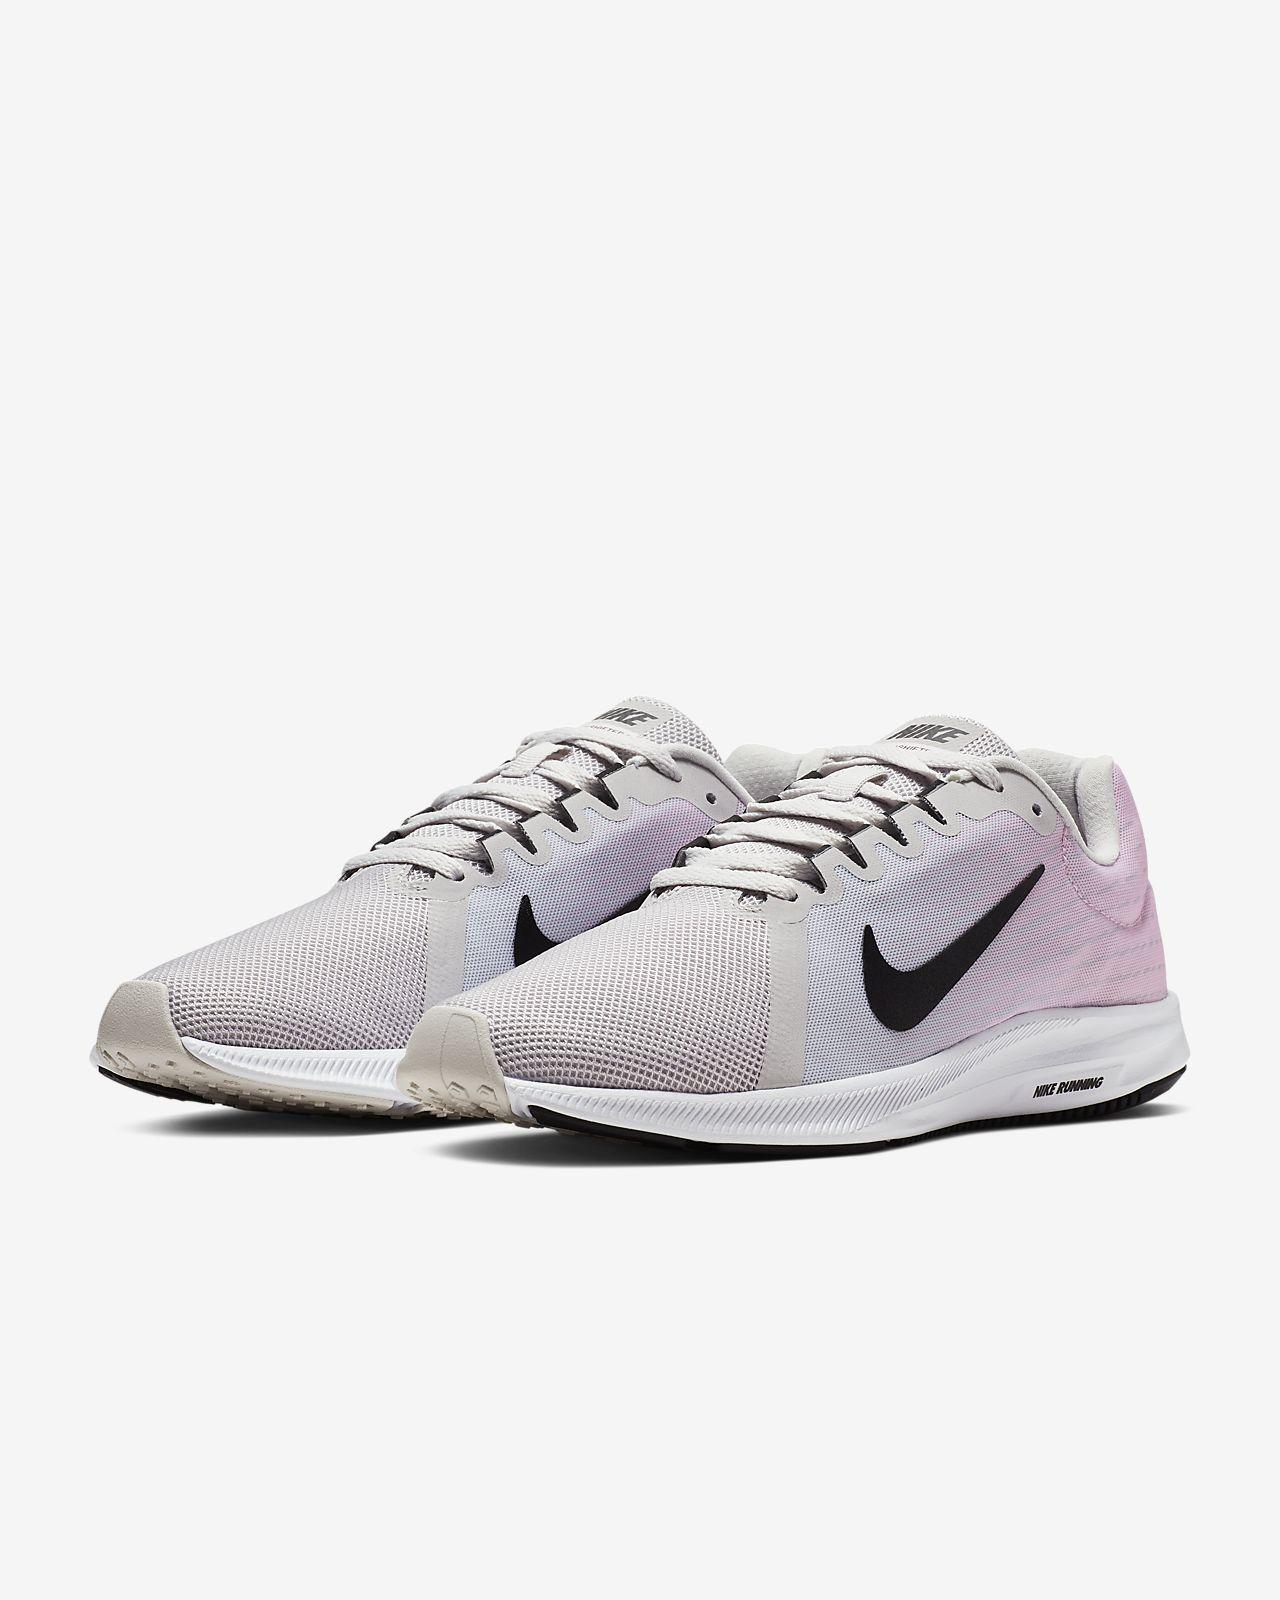 brand new 2af53 4a48e ... Chaussure de running Nike Downshifter 8 pour Femme